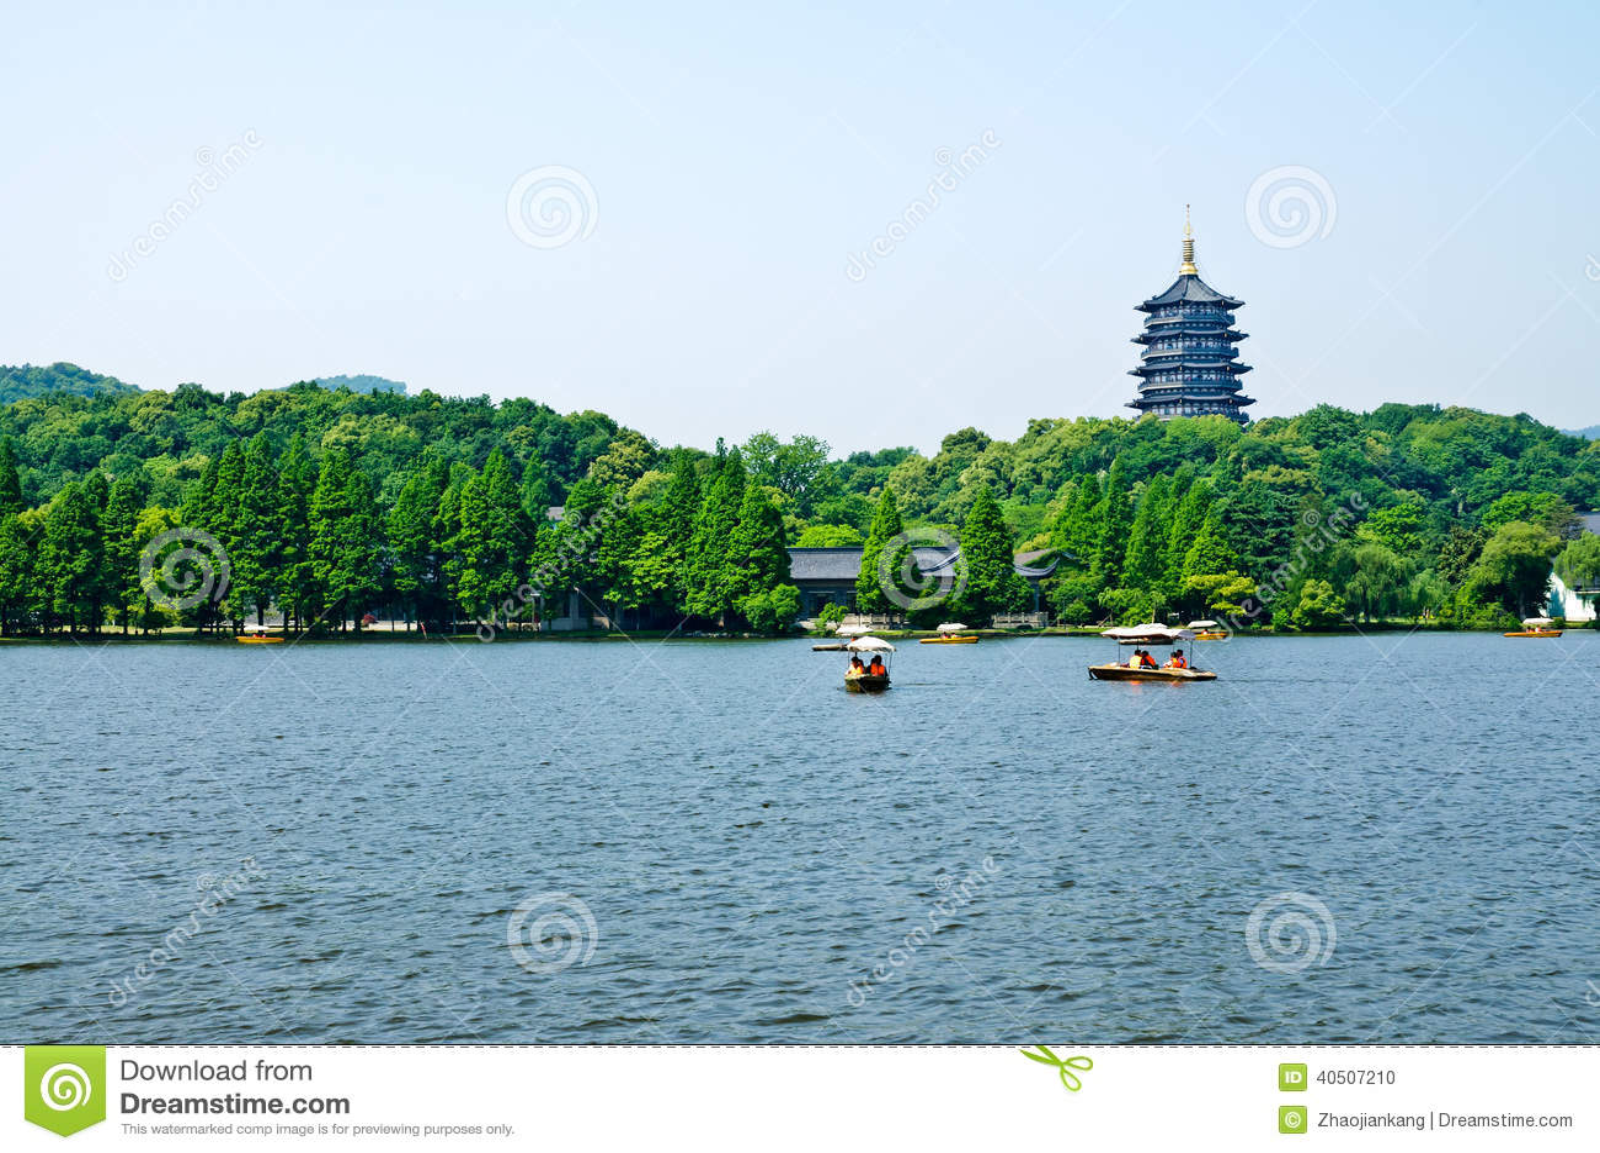 Hangzhou West Lake Scenery  In China Editorial Image